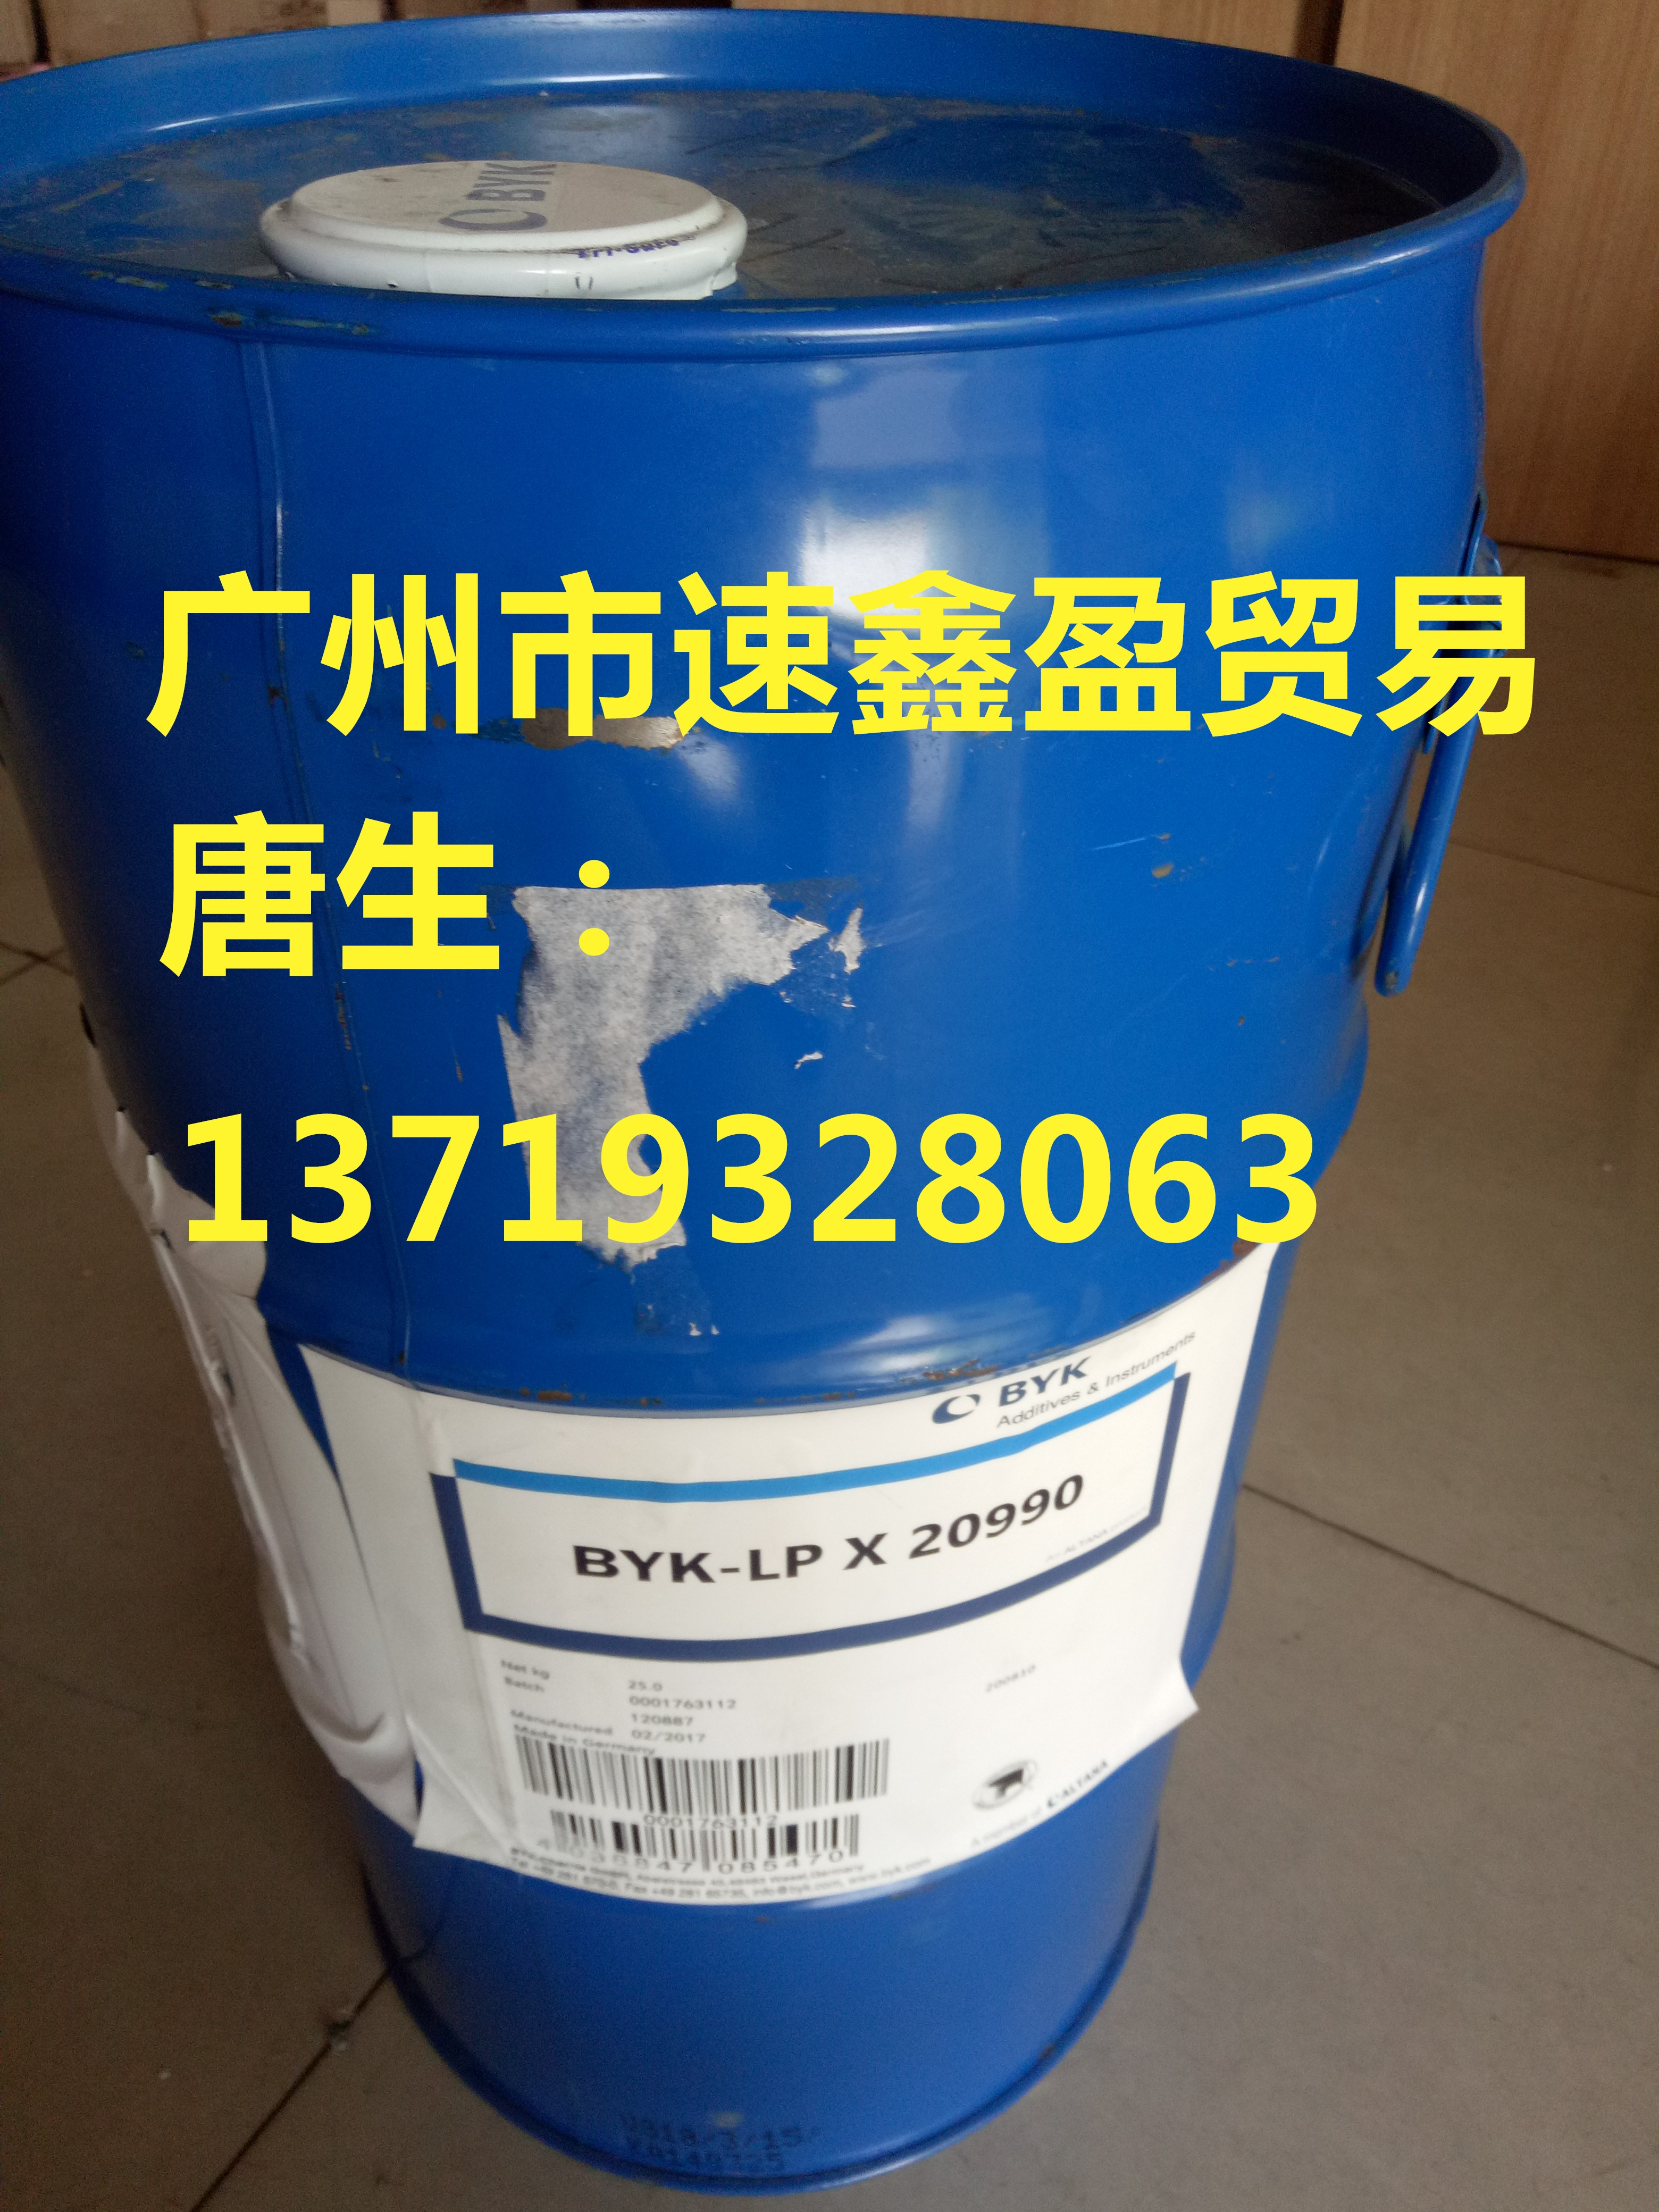 BYK配制锂离子电池润湿分散剂